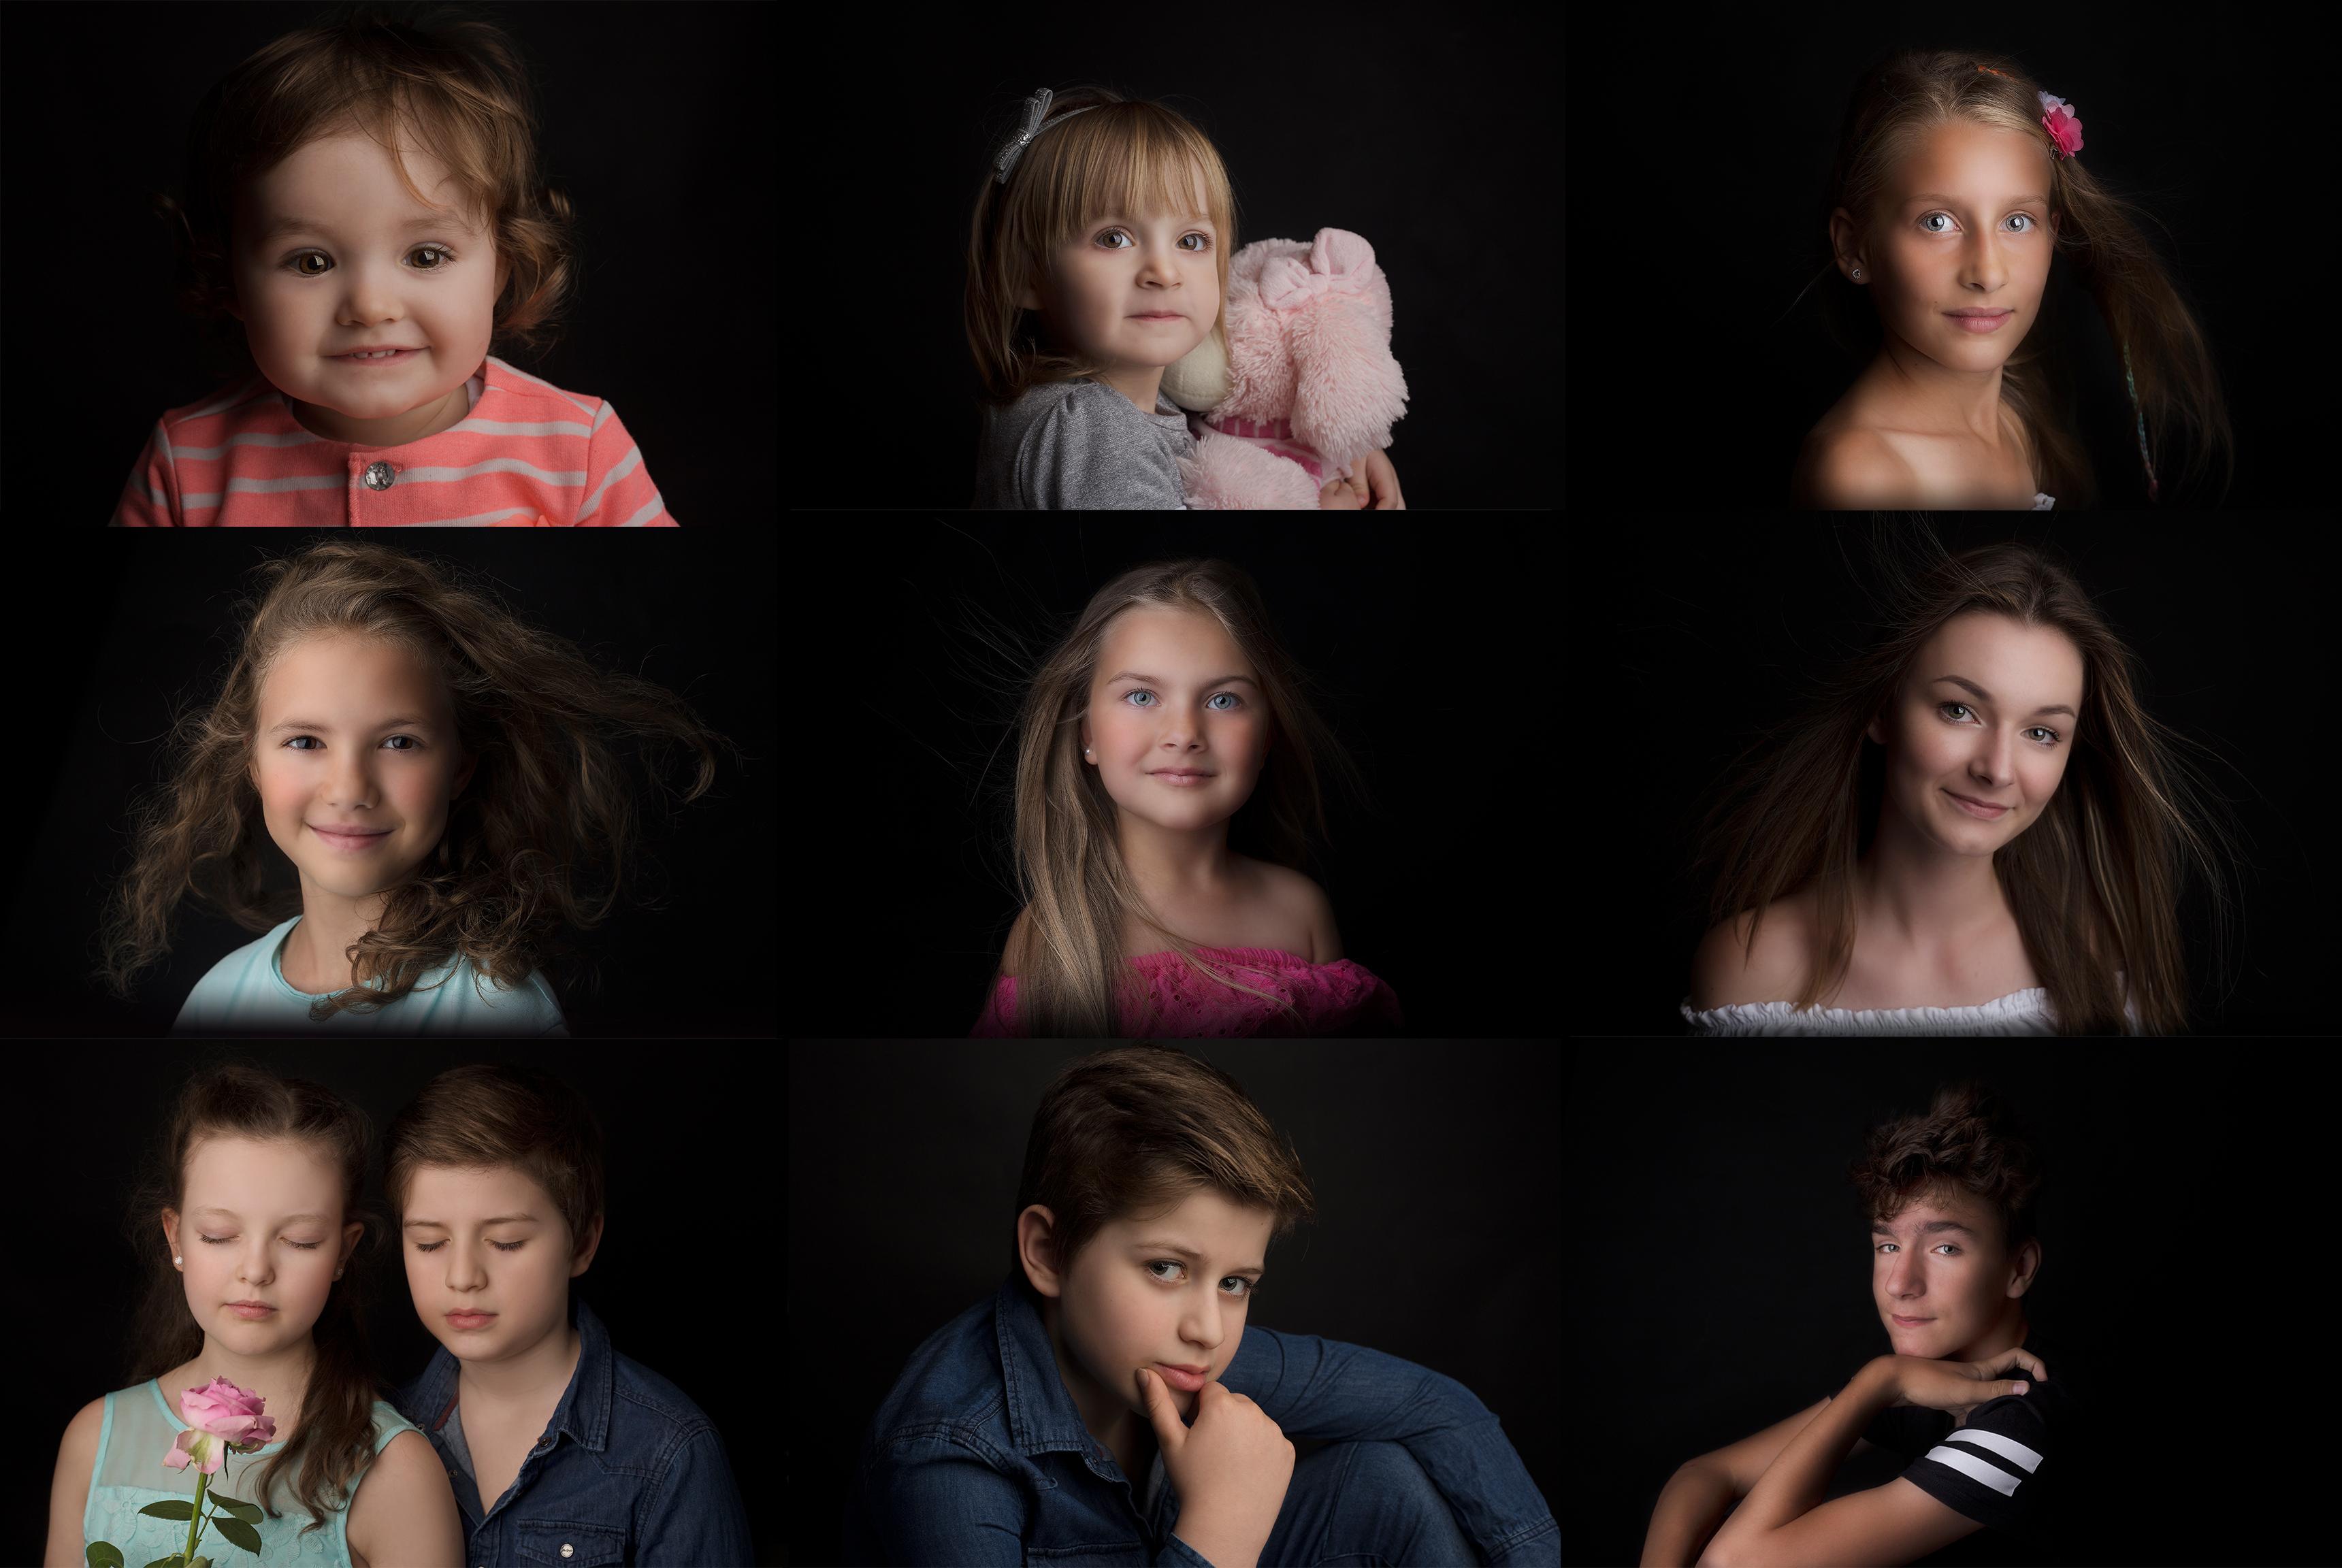 sesje portret dziecka